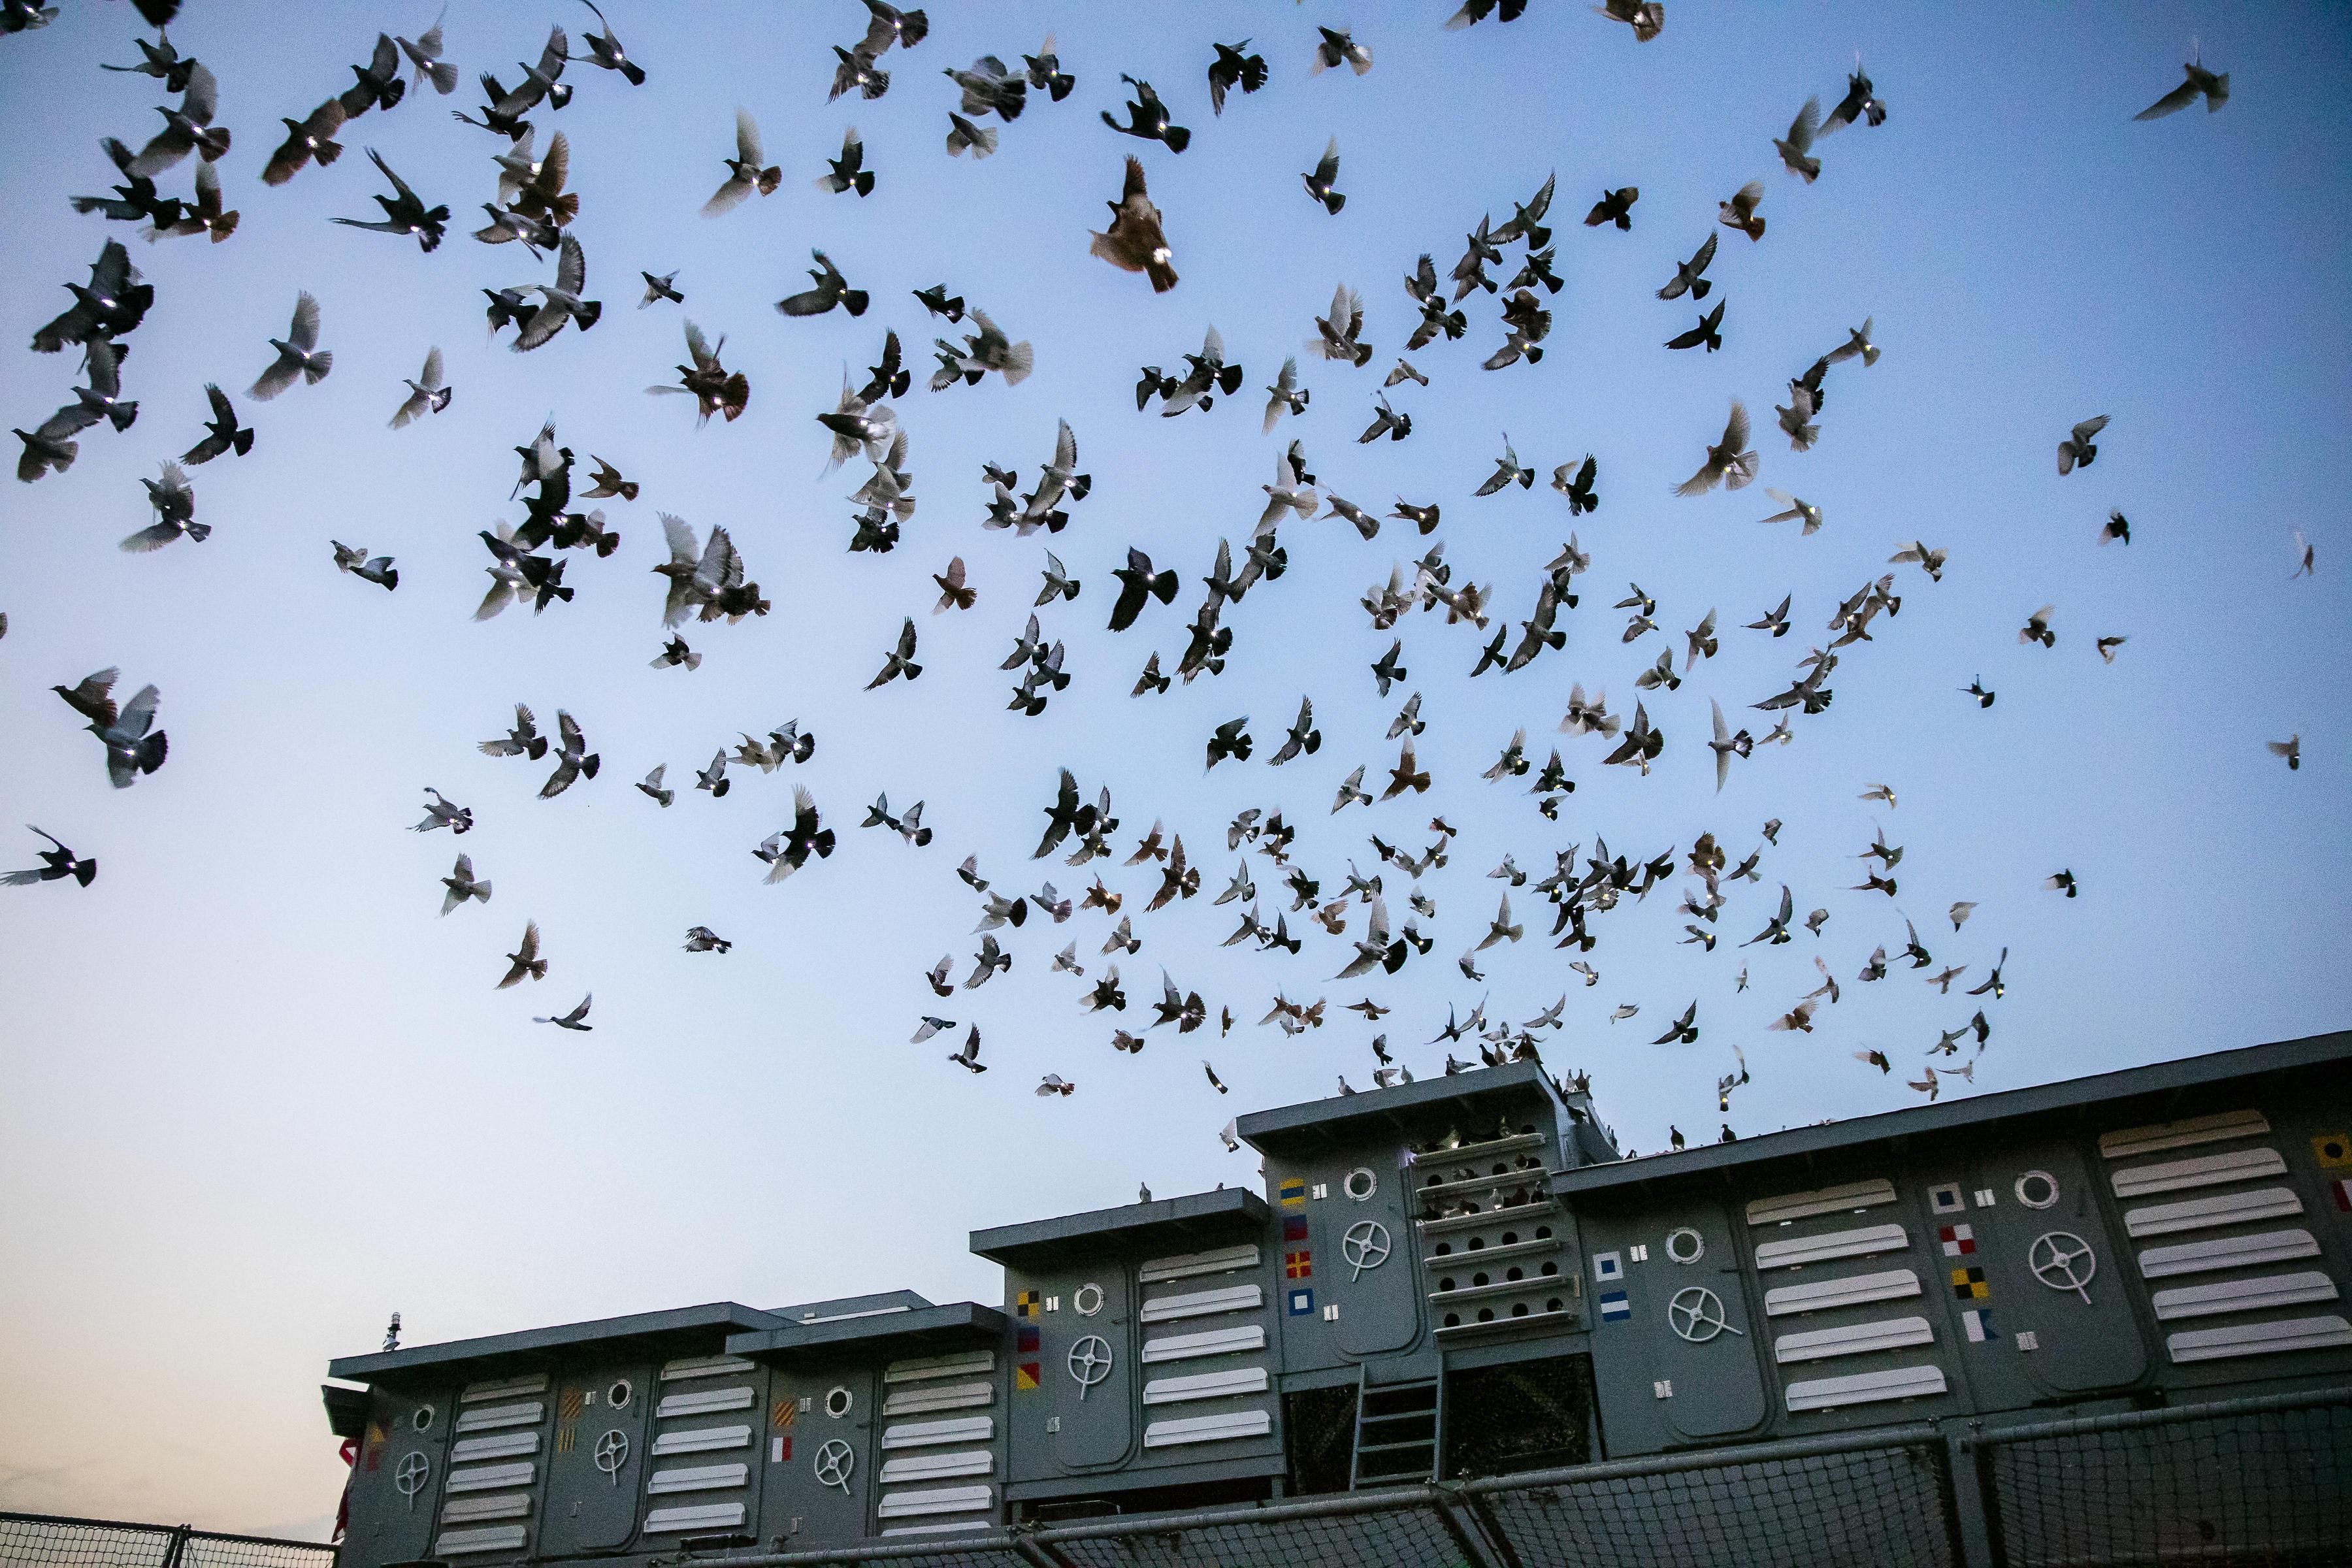 Pigeons Light Up the Night Sky